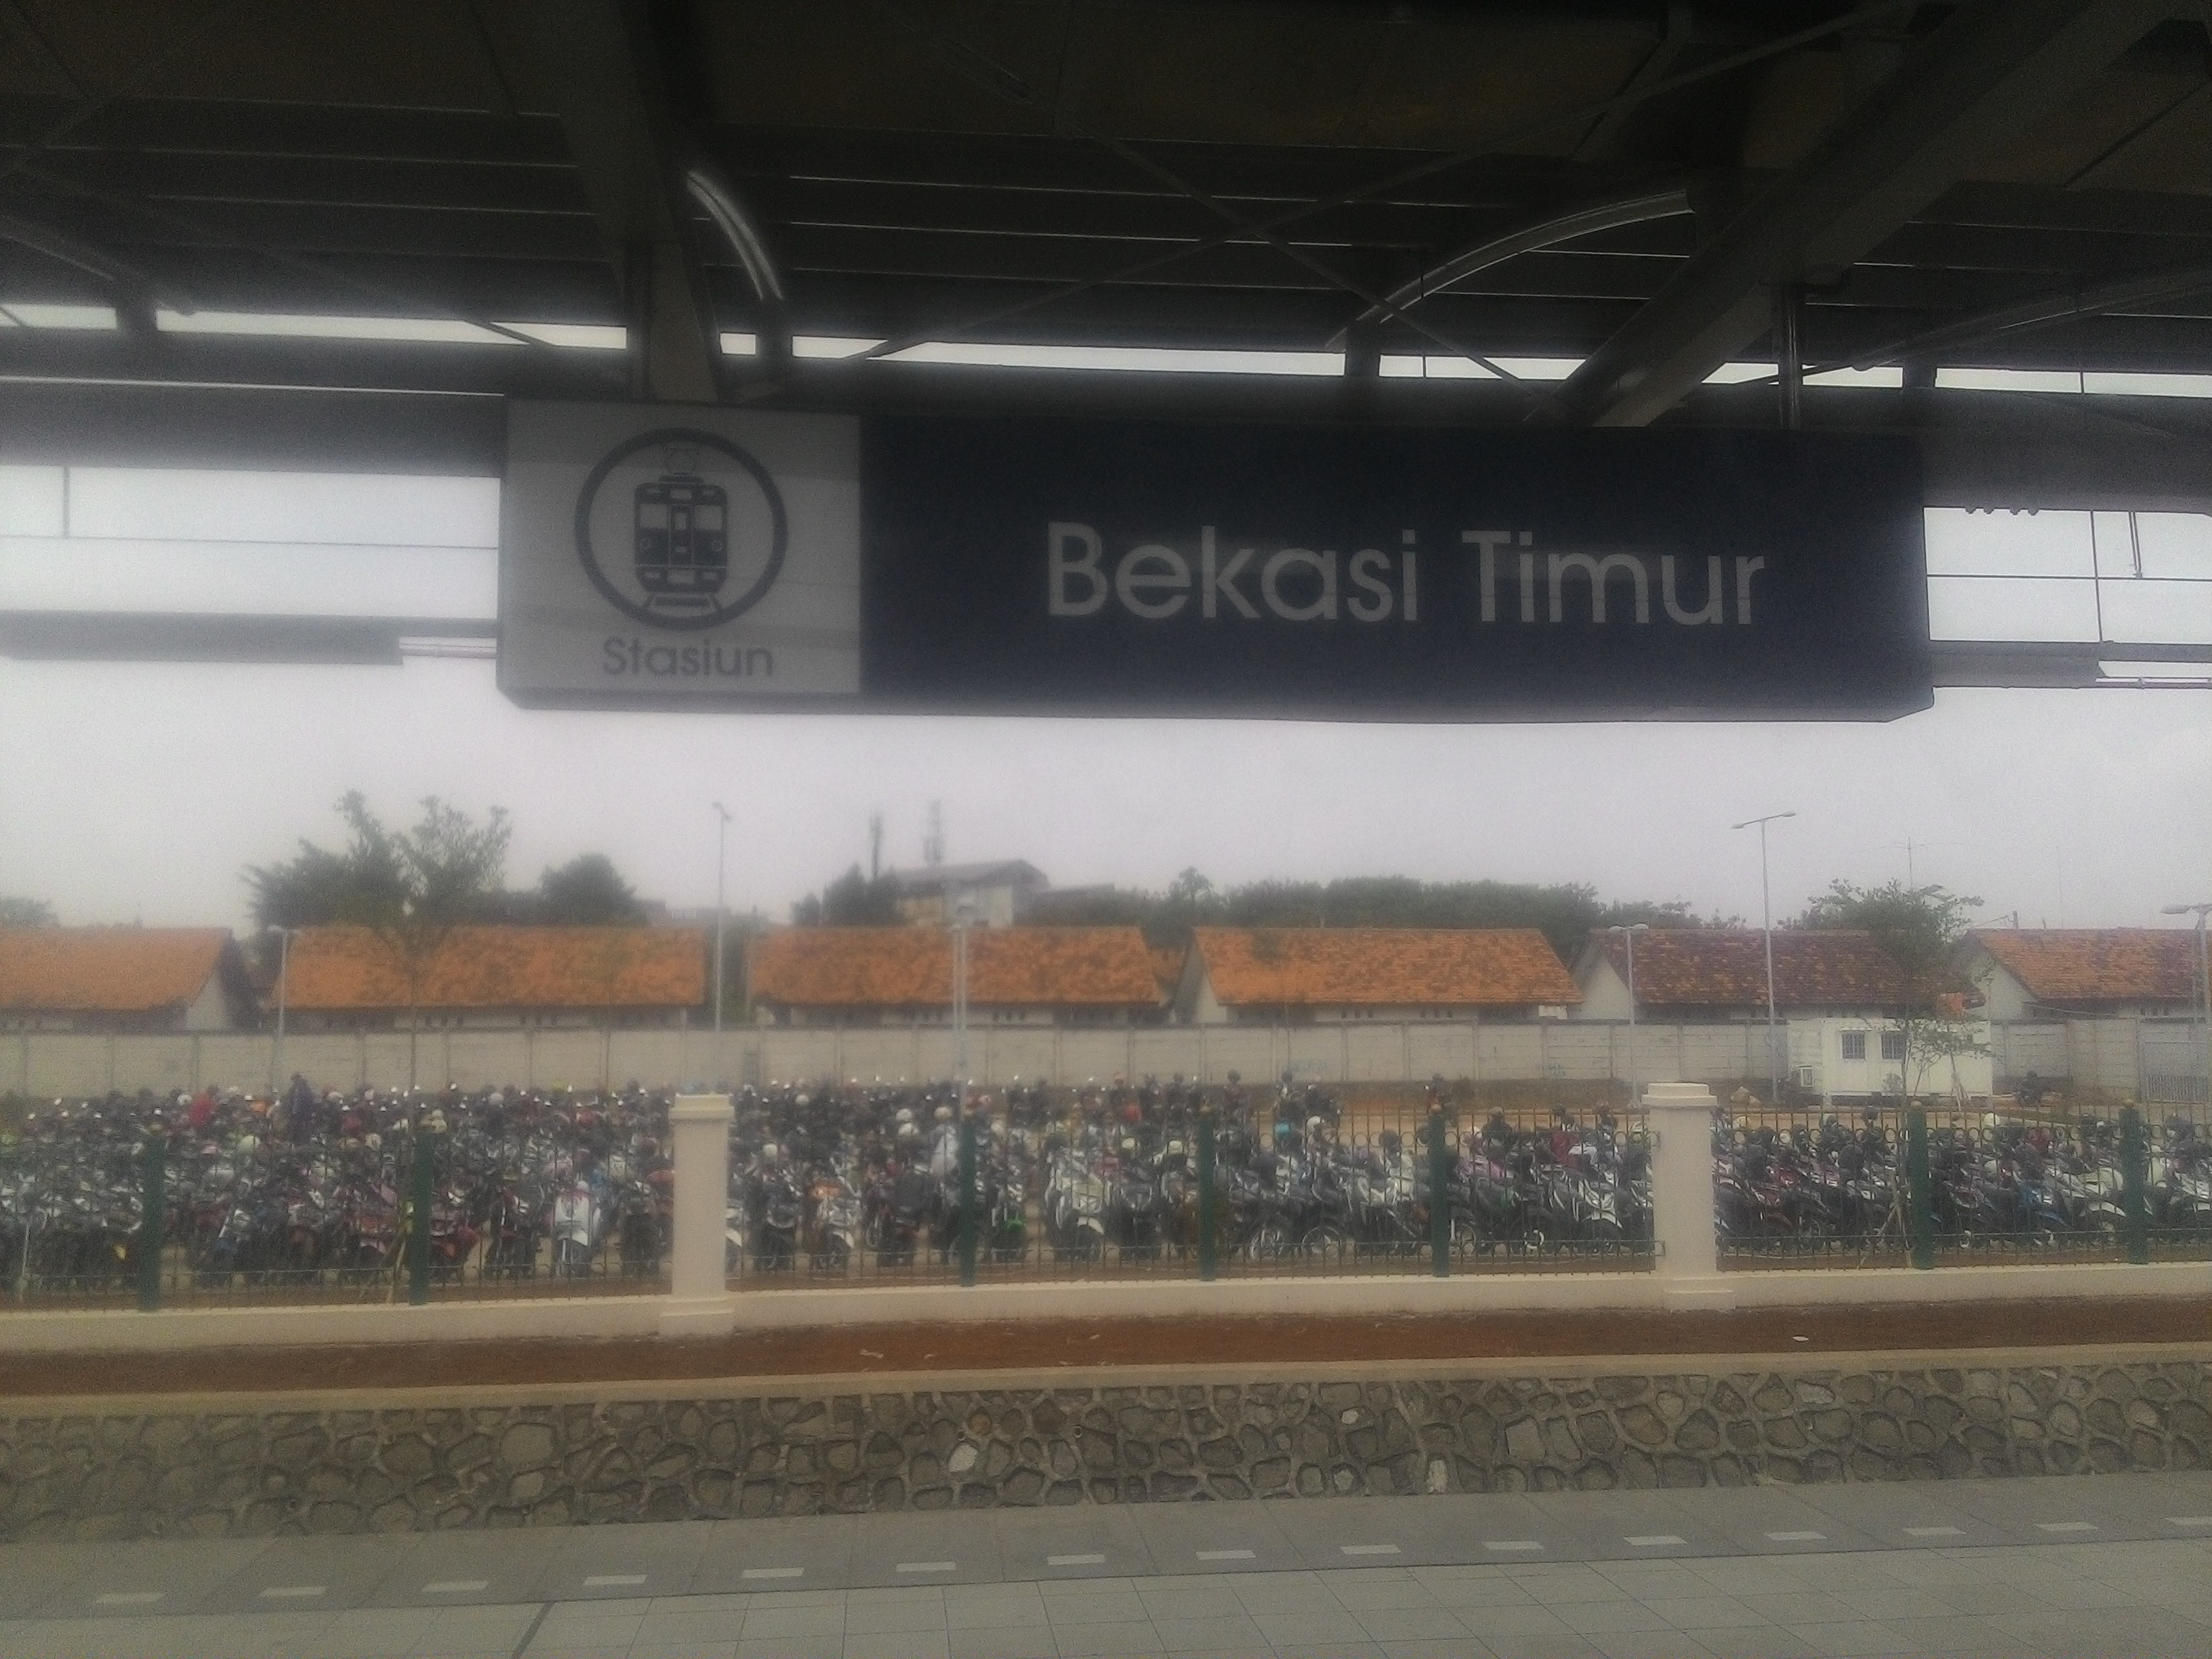 File:Papan Nama Stasiun Bekasi Timur Terbaru 2017.jpg